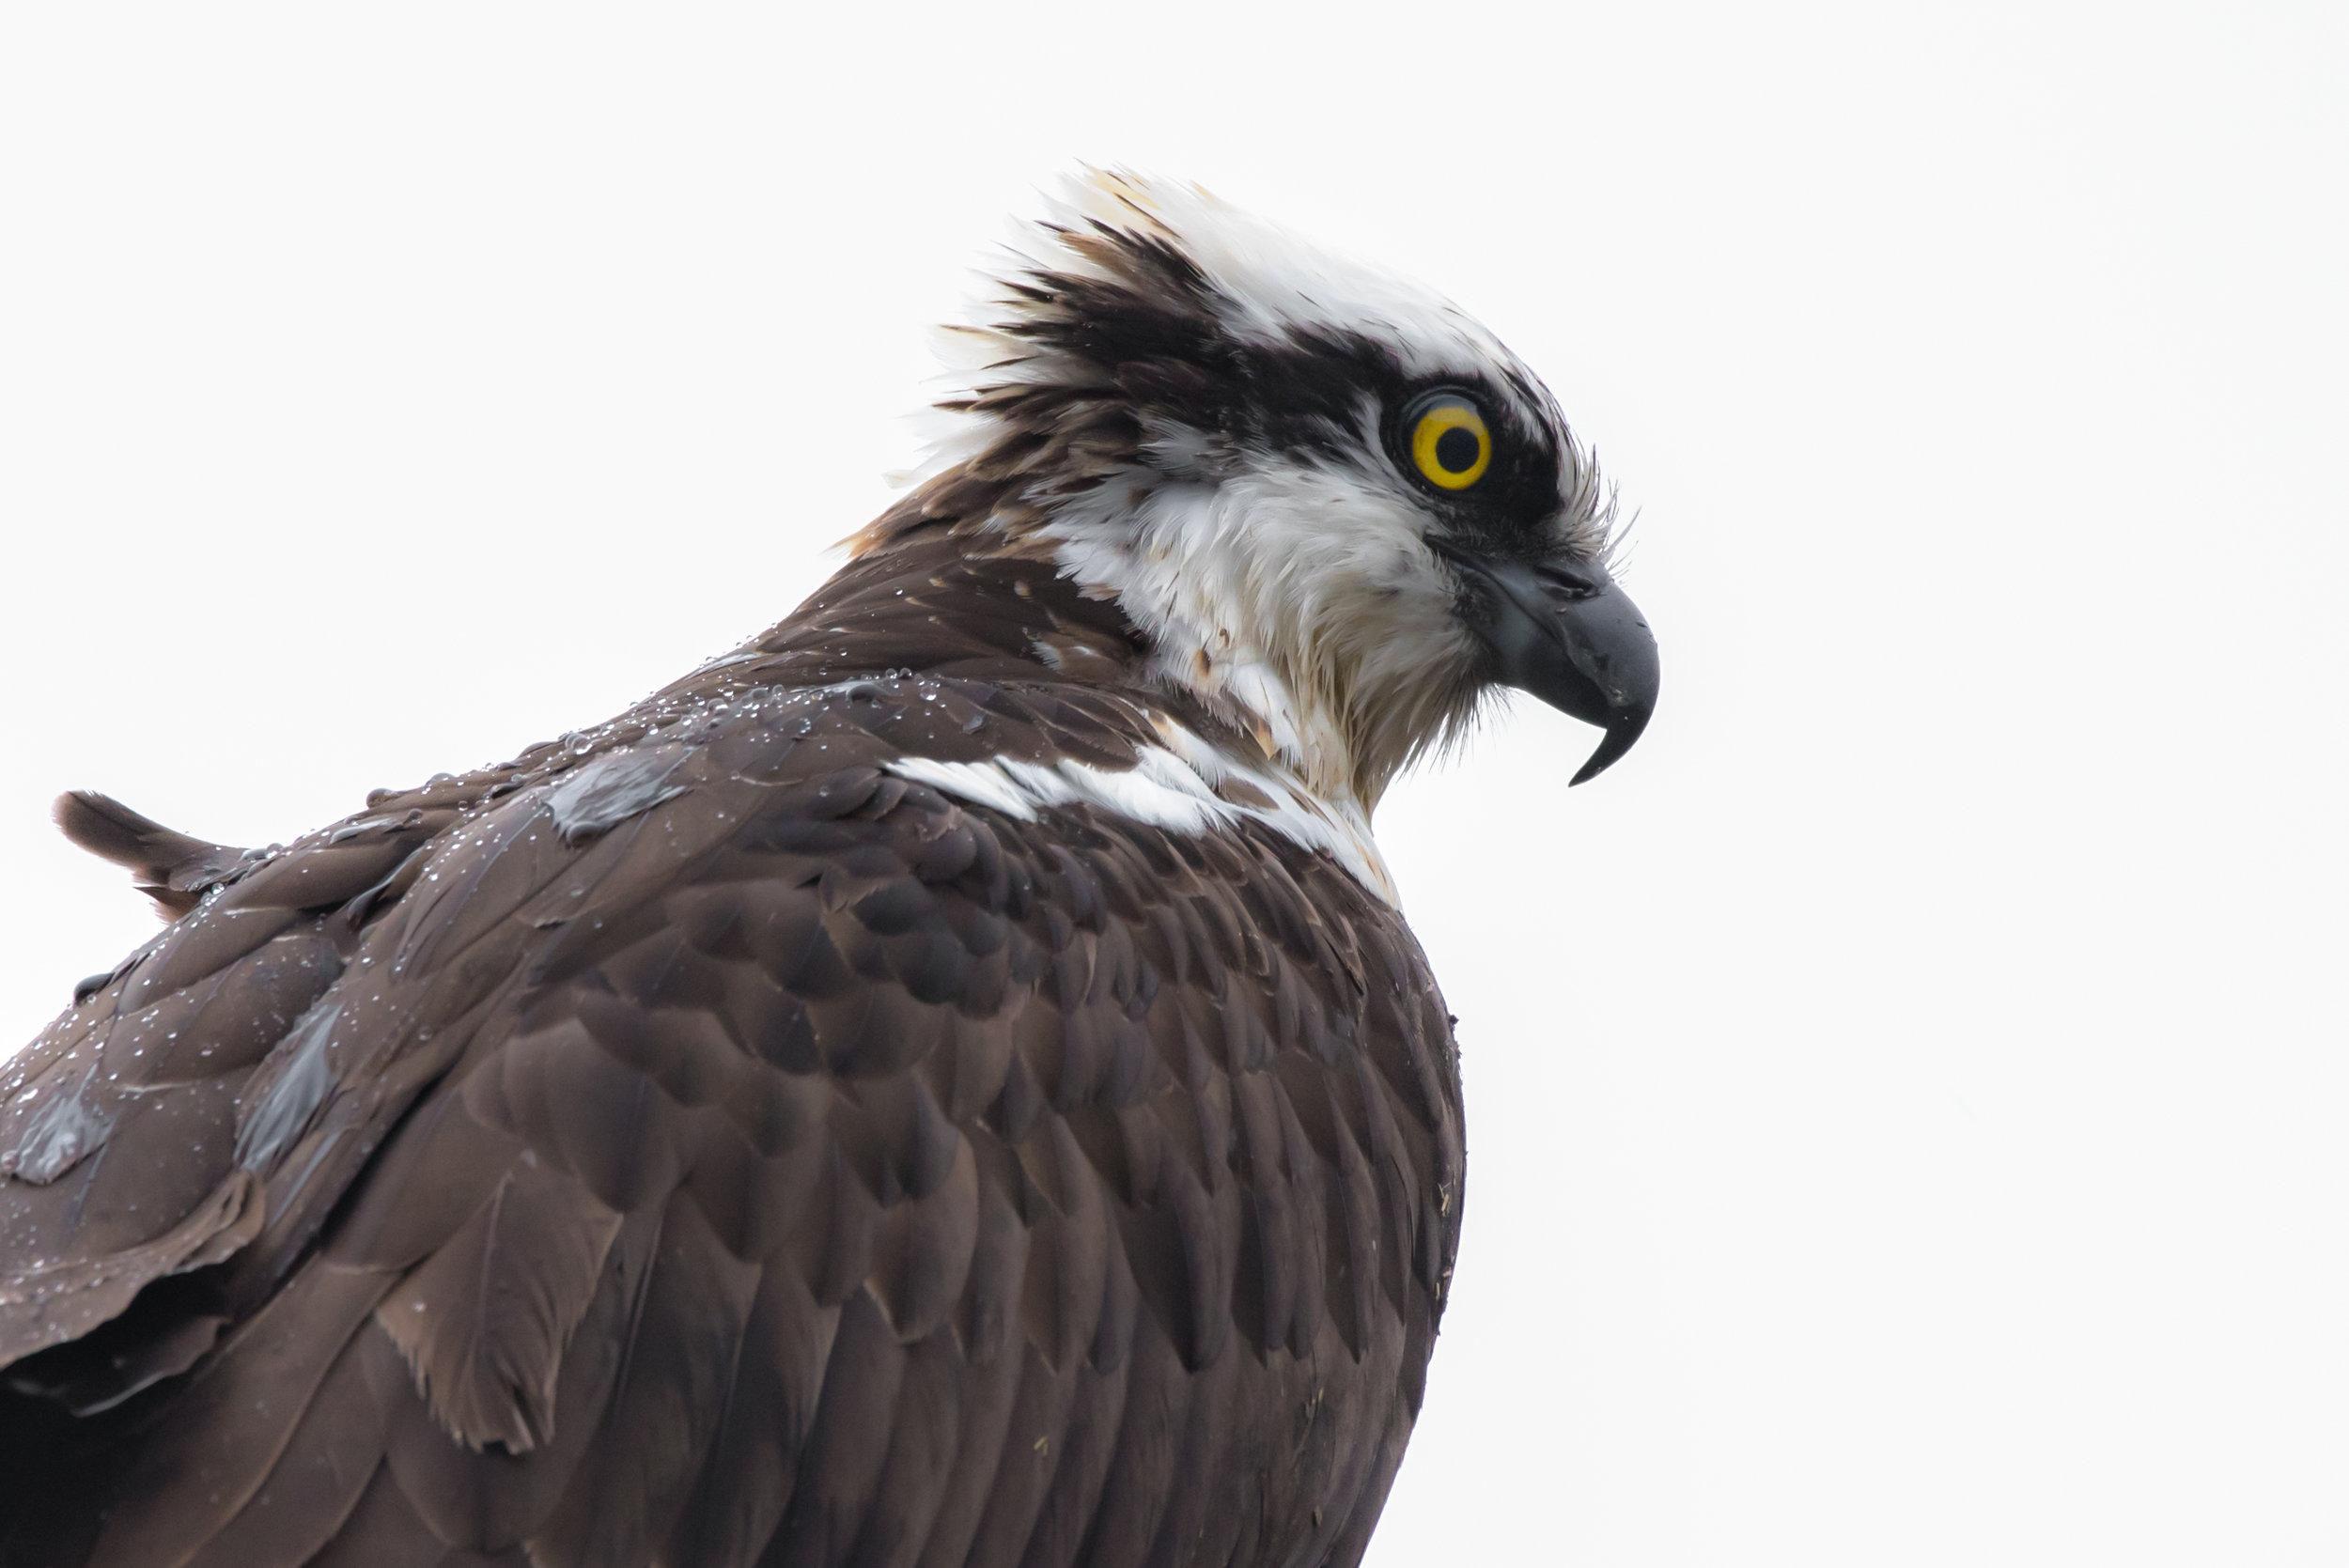 Osprey Portrait (Close Up)